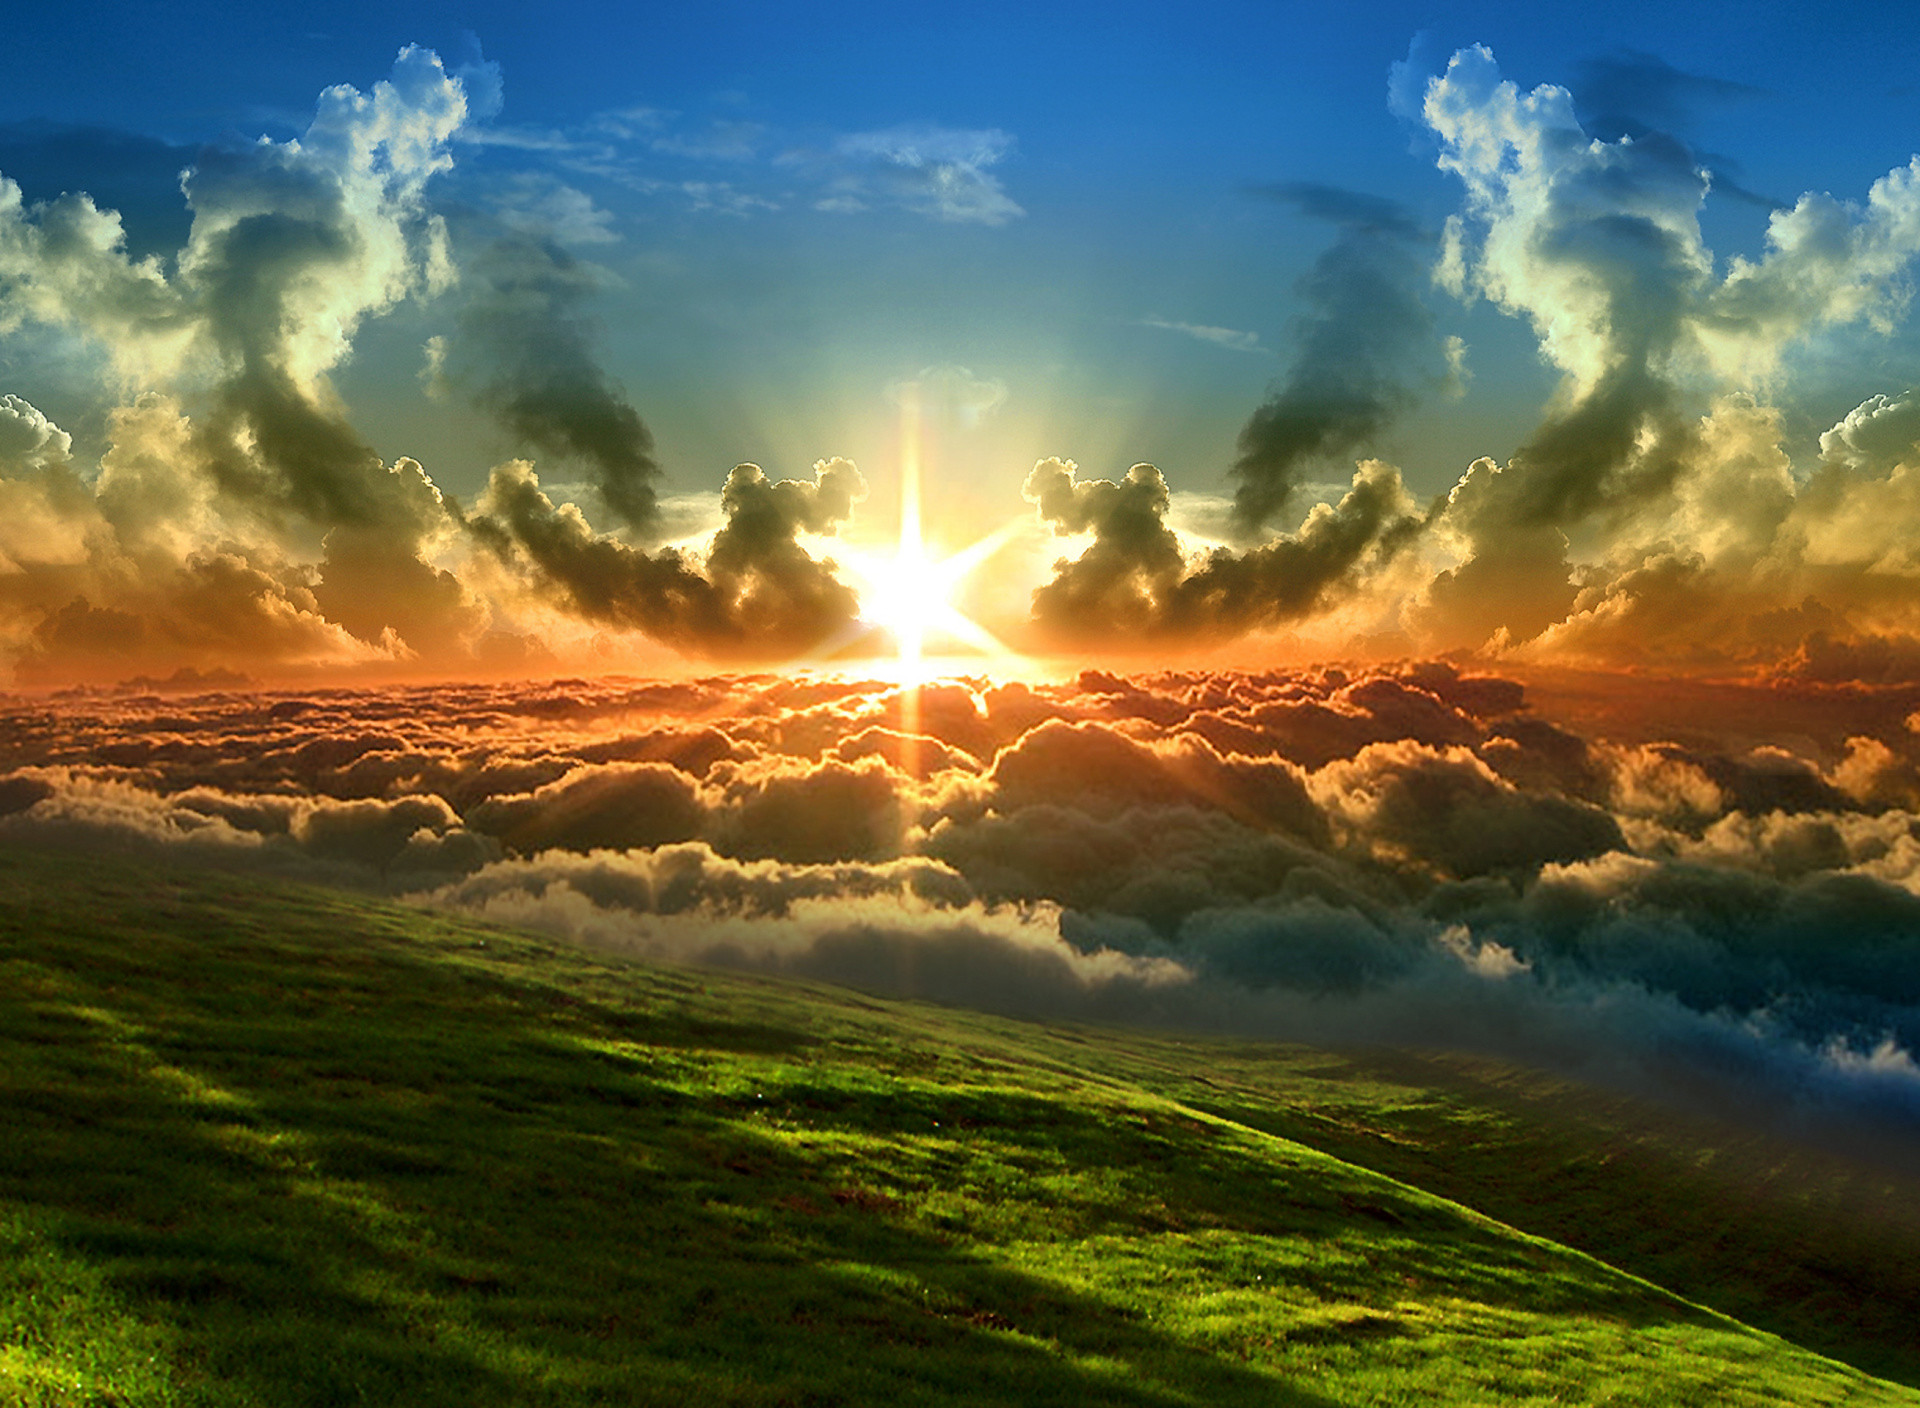 Sunrise free Screensaver wallpaper